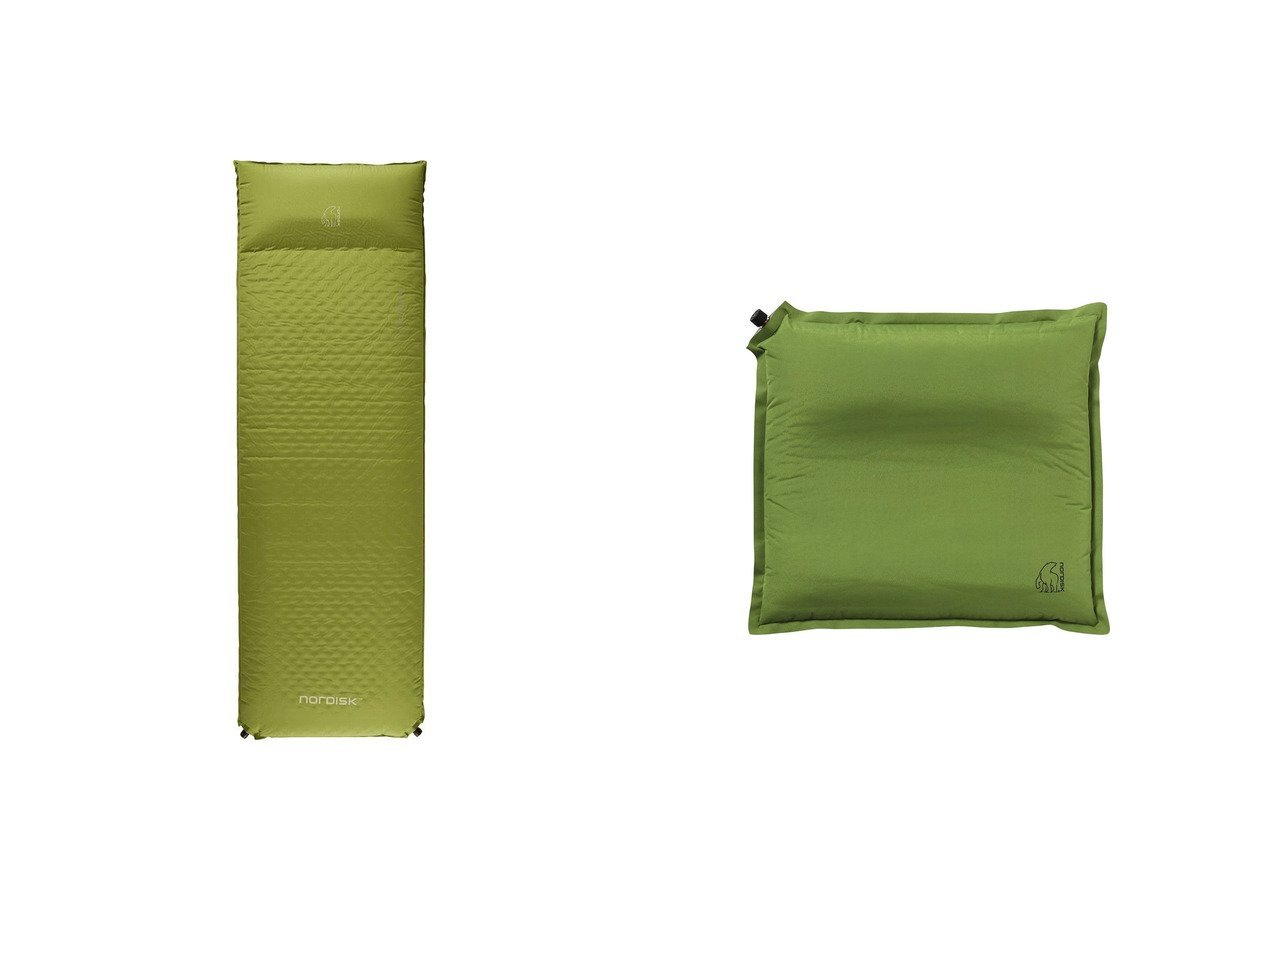 【Nordisk/ノルディスク】のボーンホルム 10.0 114026&シュラフ 寝袋 ピロー 枕 モーガン 114042 おすすめ!人気キャンプ・アウトドア用品の通販 おすすめで人気の流行・トレンド、ファッションの通販商品 メンズファッション・キッズファッション・インテリア・家具・レディースファッション・服の通販 founy(ファニー) https://founy.com/ スクエア チューブ フォーム ホーム・キャンプ・アウトドア Home,Garden,Outdoor,Camping Gear キャンプ用品・アウトドア  Camping Gear & Outdoor Supplies その他 雑貨 小物 Camping Tools ホーム・キャンプ・アウトドア Home,Garden,Outdoor,Camping Gear キャンプ用品・アウトドア  Camping Gear & Outdoor Supplies 寝具 シュラフ 枕 Schlaf, Sleeping bag, Pillow |ID:crp329100000037431